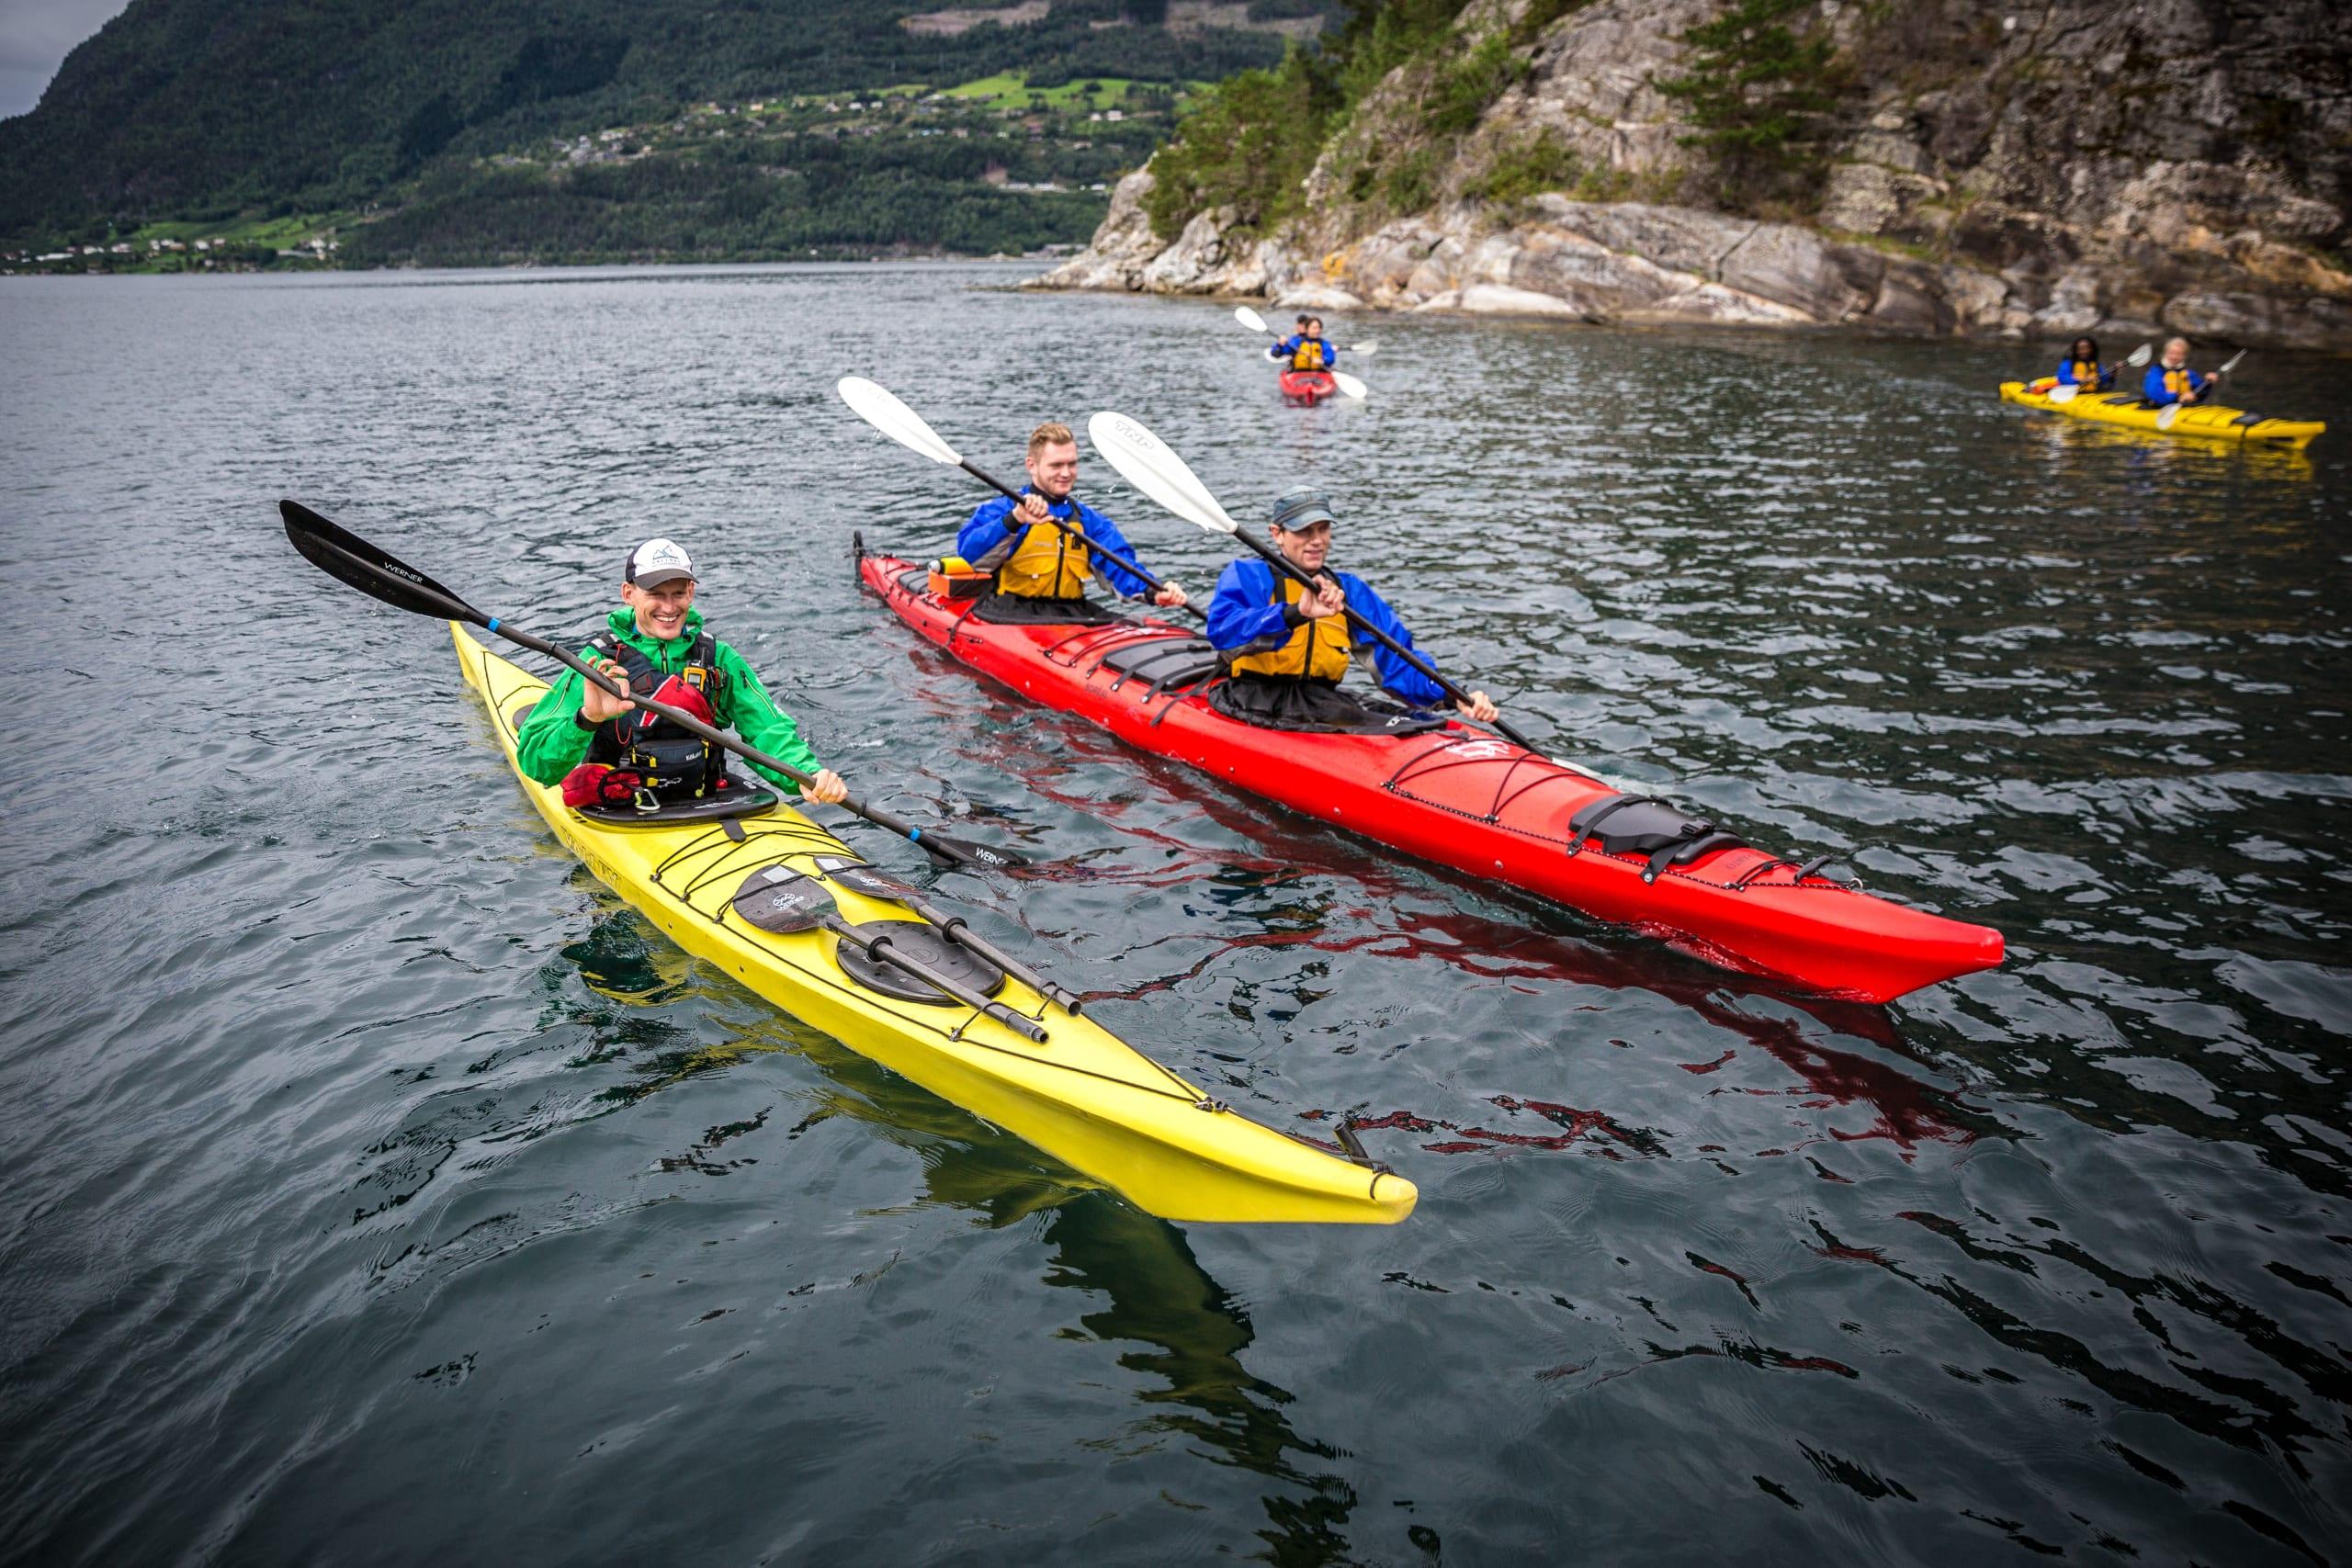 Fjord kayaking from Valldal